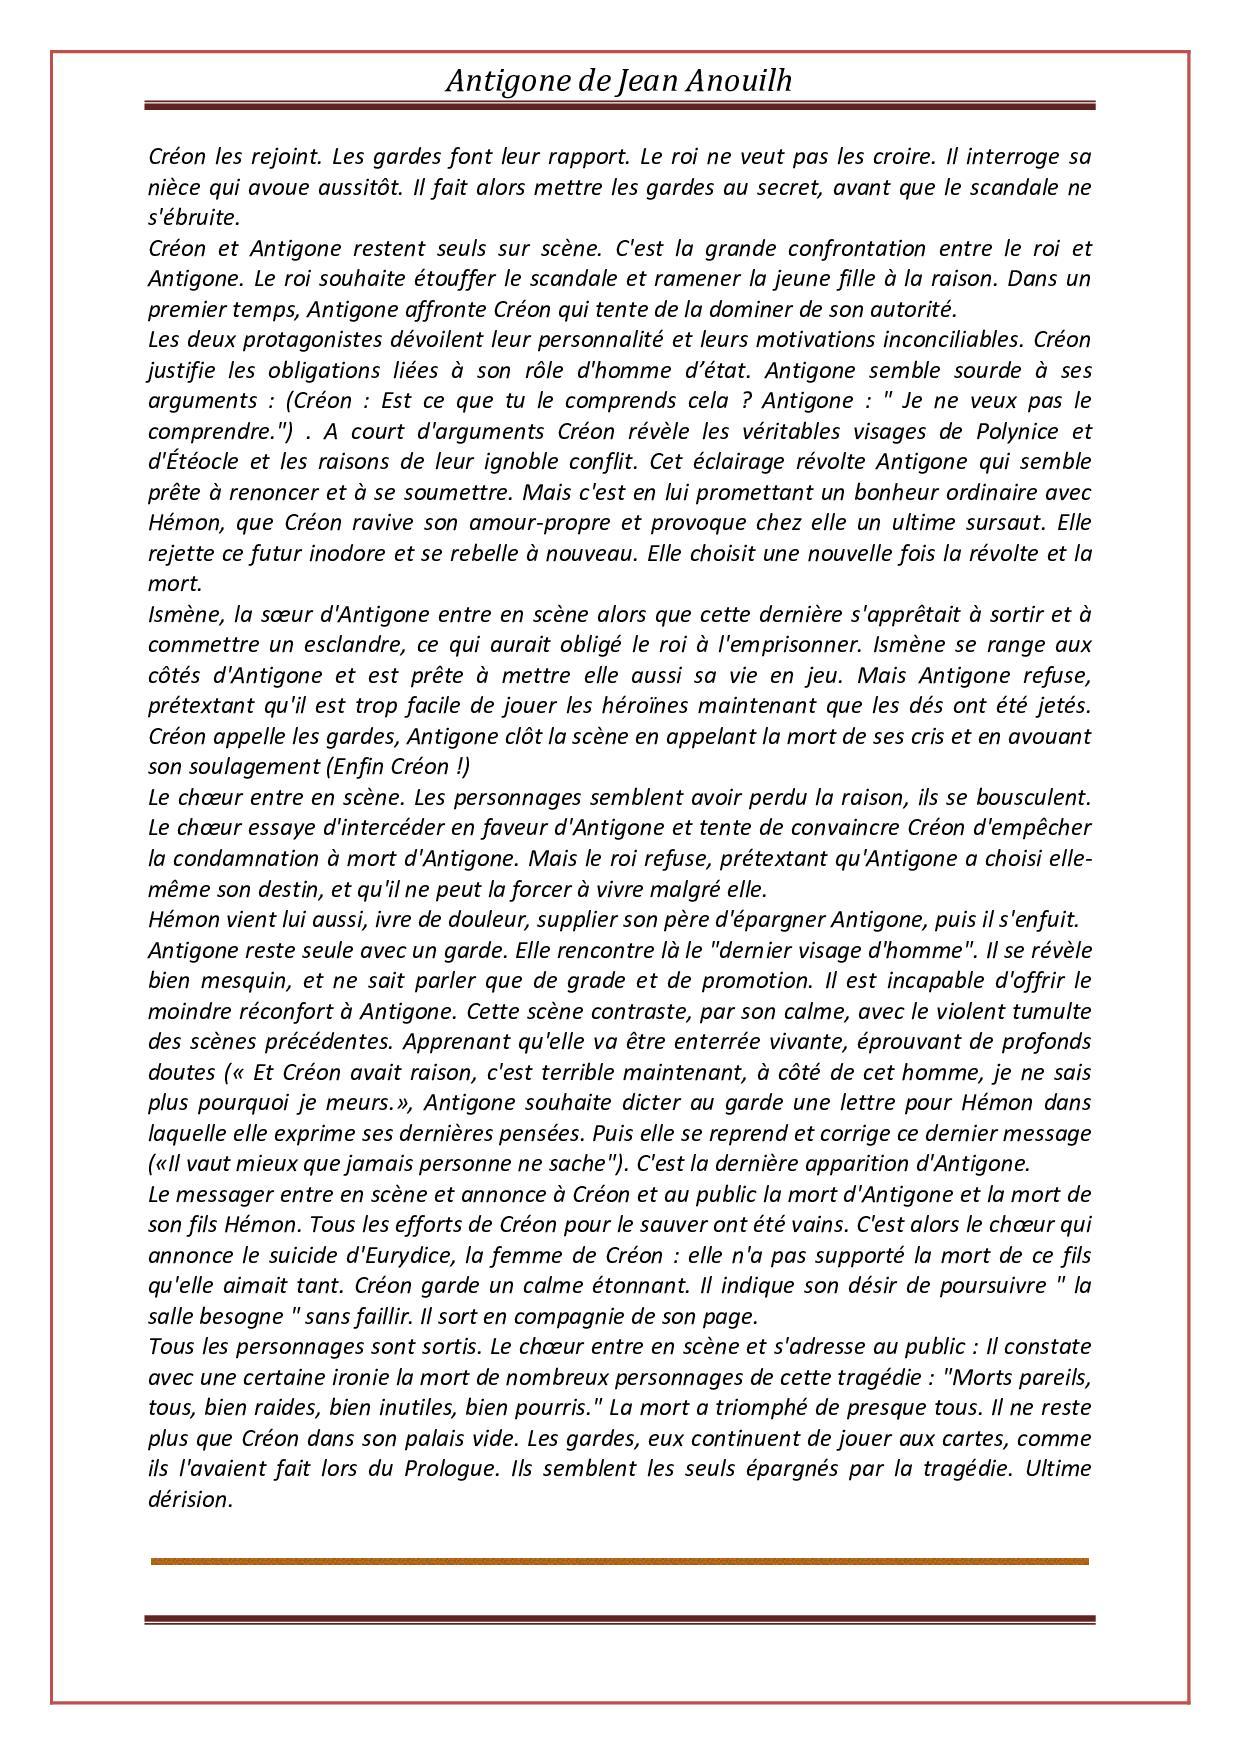 antigone jean anouilh pdf francais